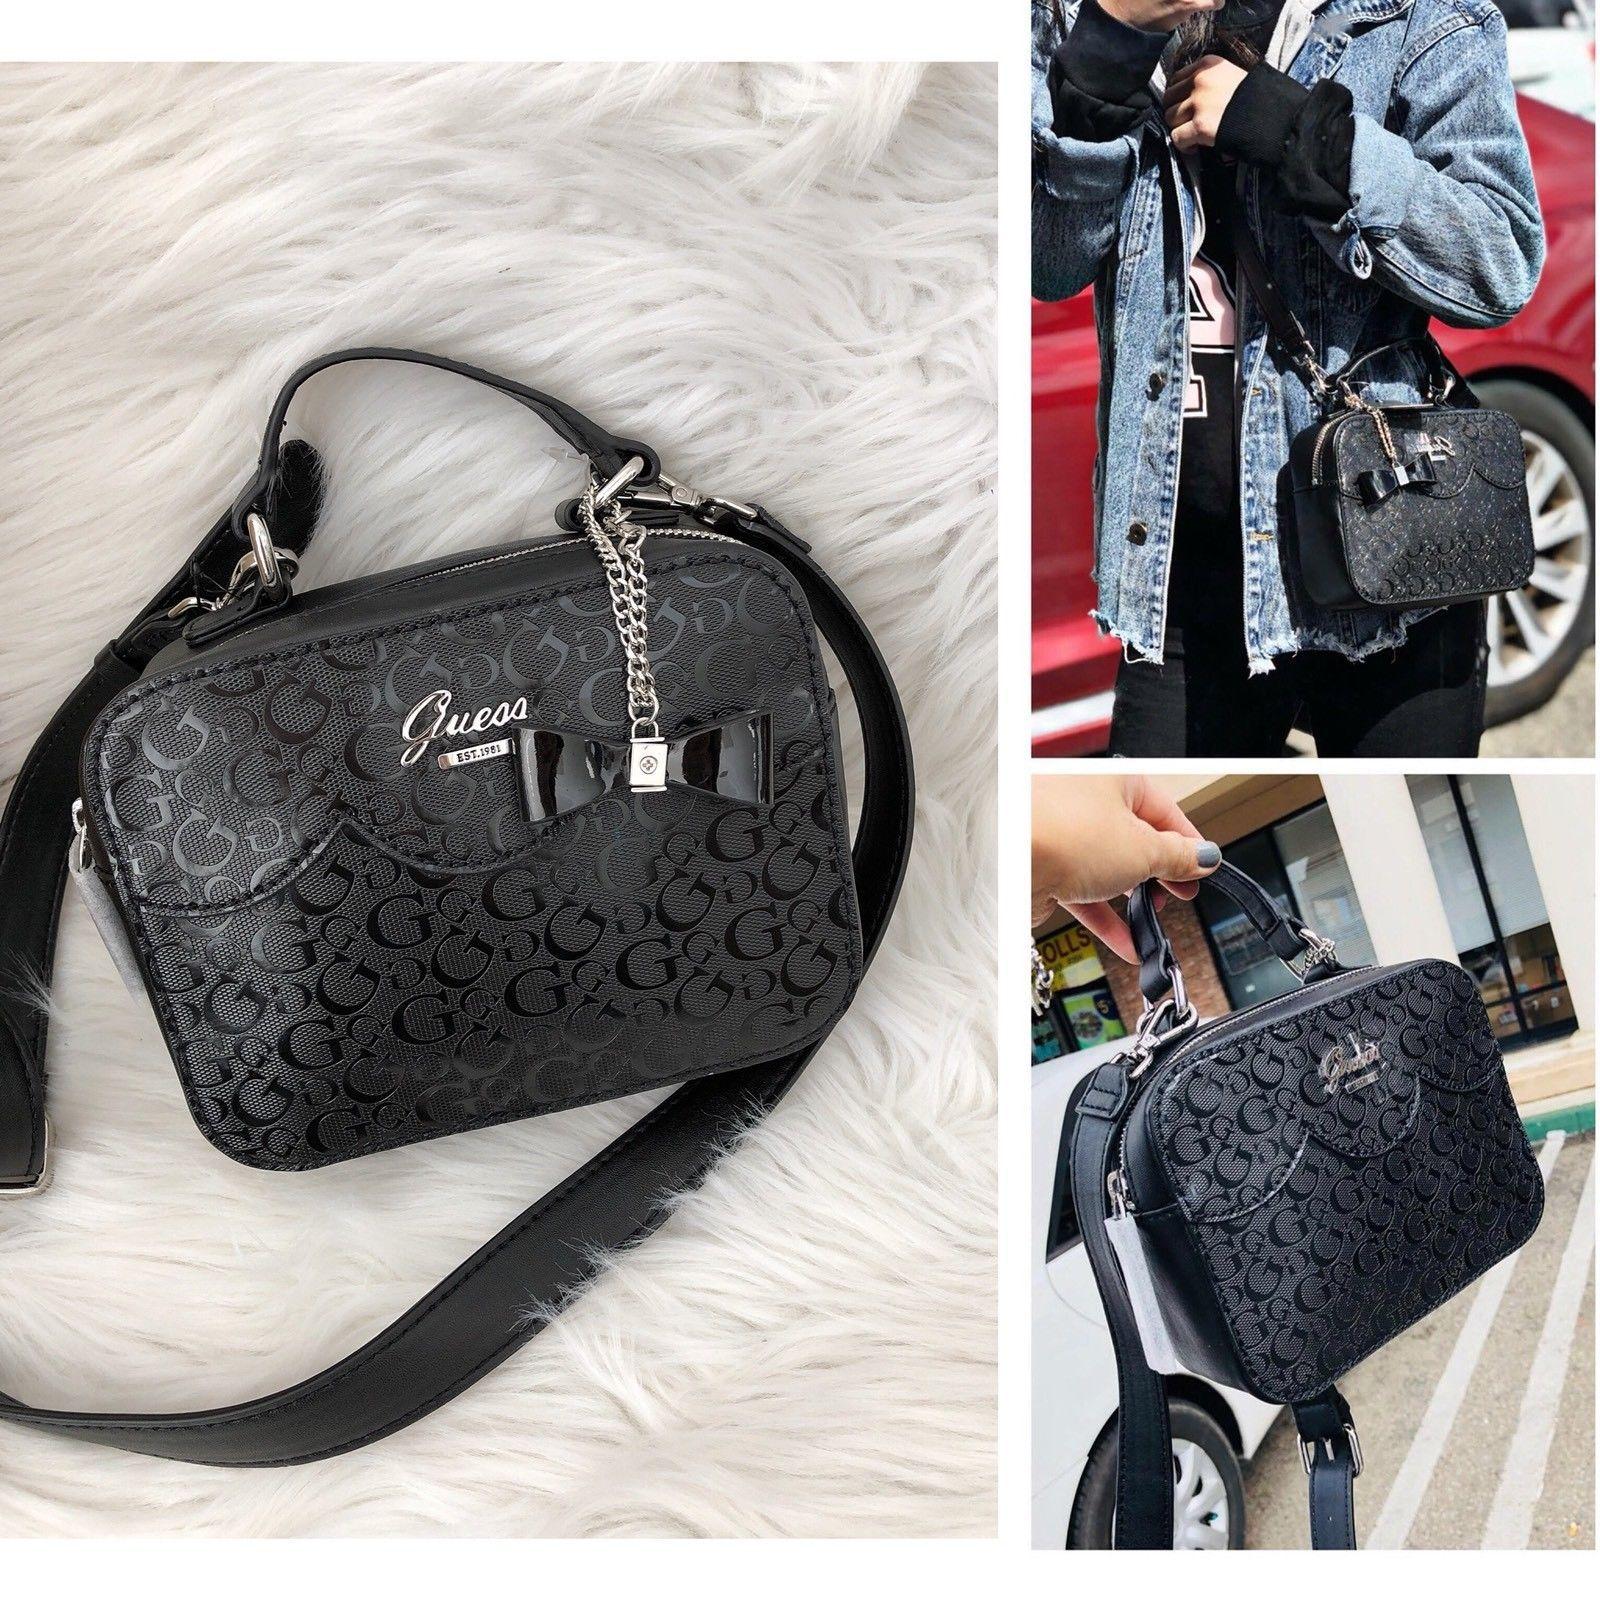 NEW PU Handbags Top Zip Bags Black Purse DEVYN Mini Saffiano Crossbody